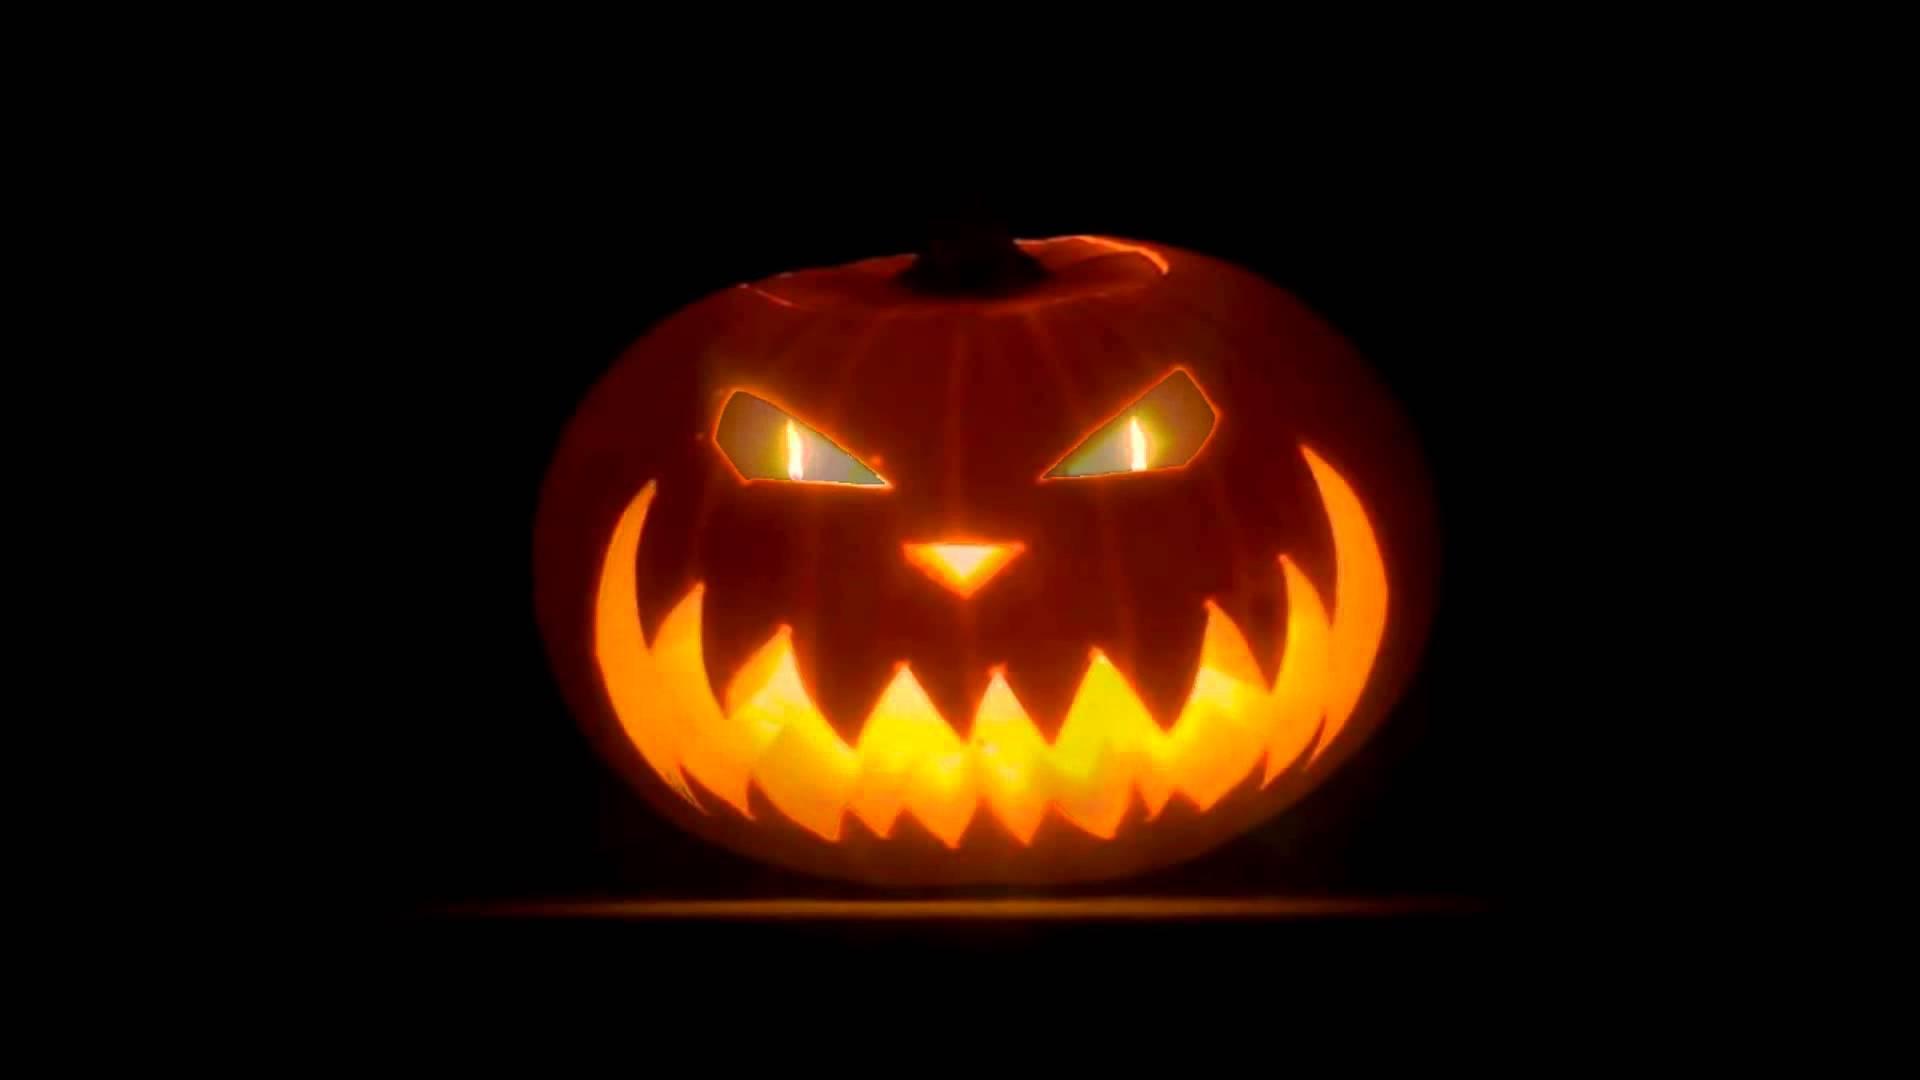 100+ Halloween Pumpkin Carving Designs 2018 – Faces, Designs - Scary Pumpkin Stencils Free Printable